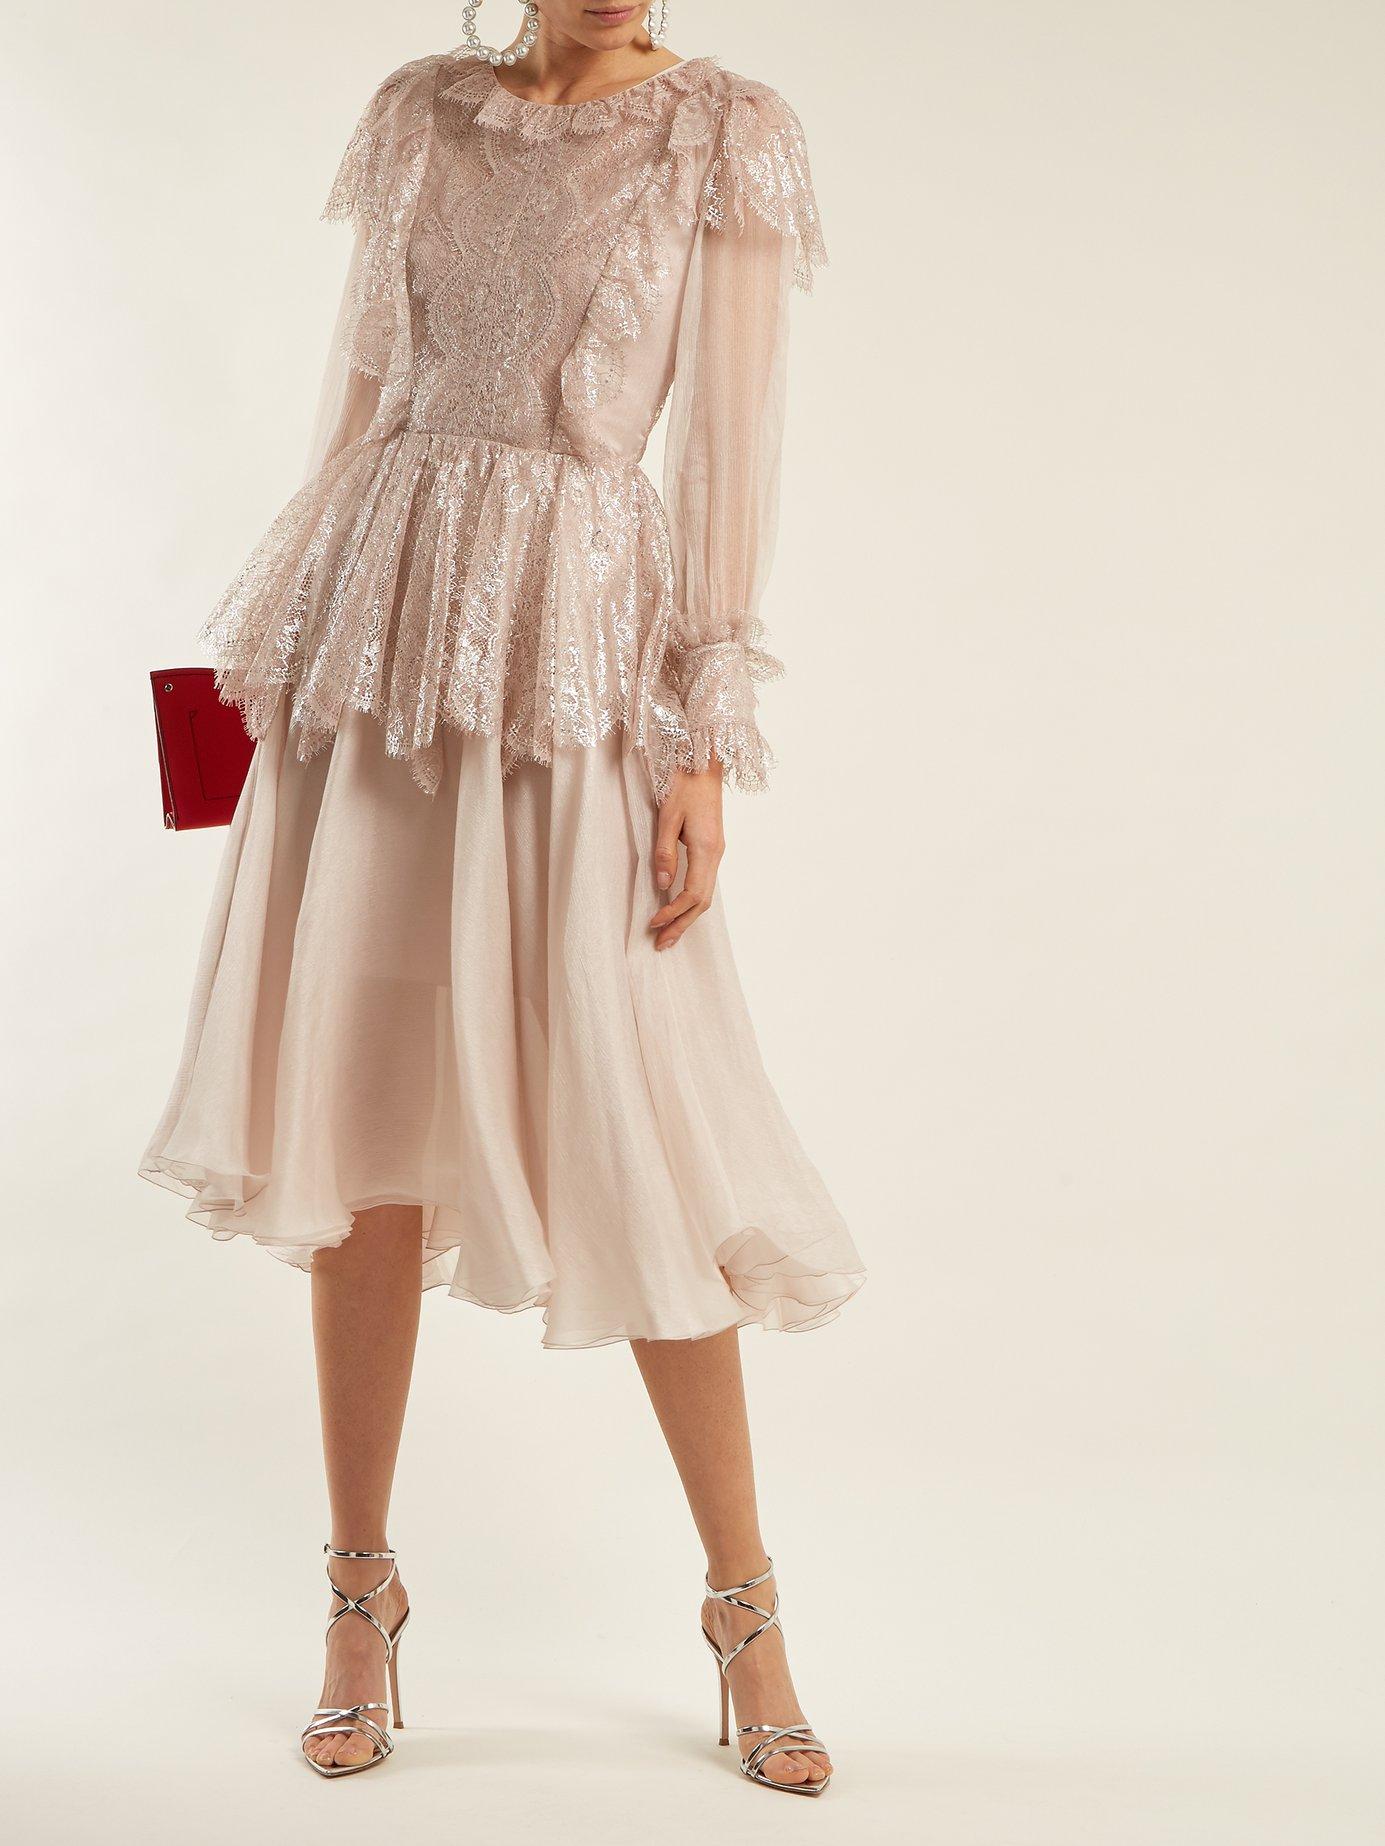 Fleur lace-trimmed silk-mousseline dress by Maria Lucia Hohan